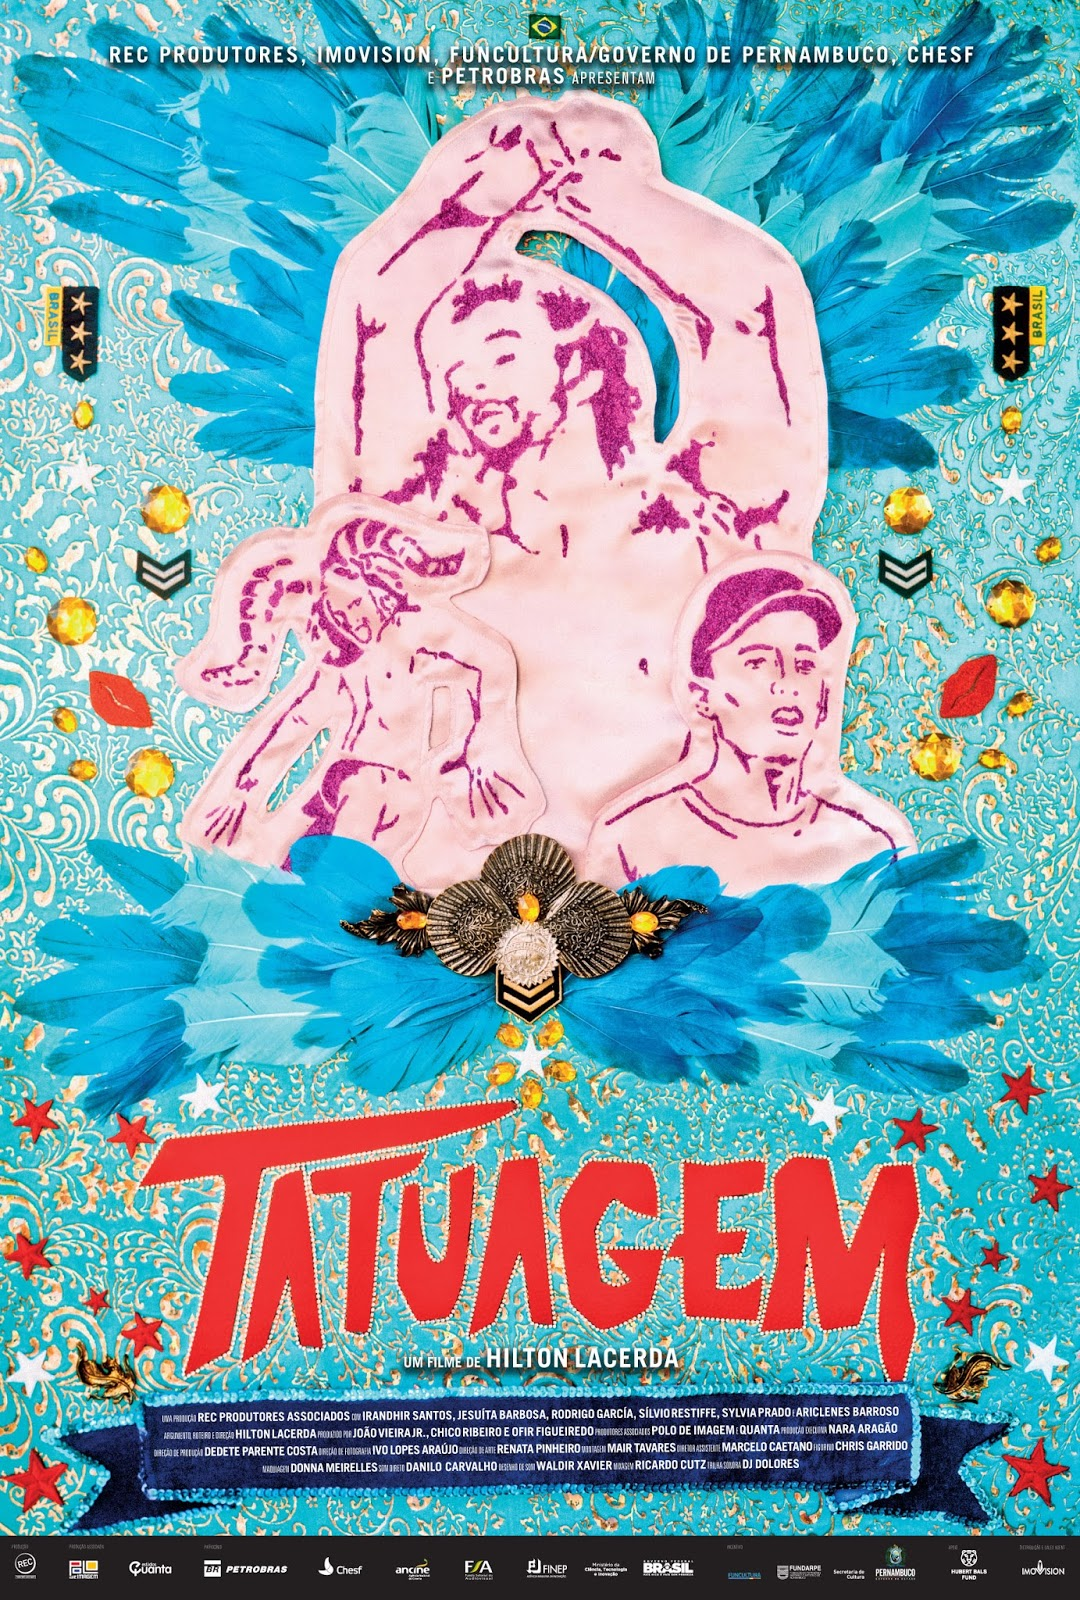 tatuagem_poster